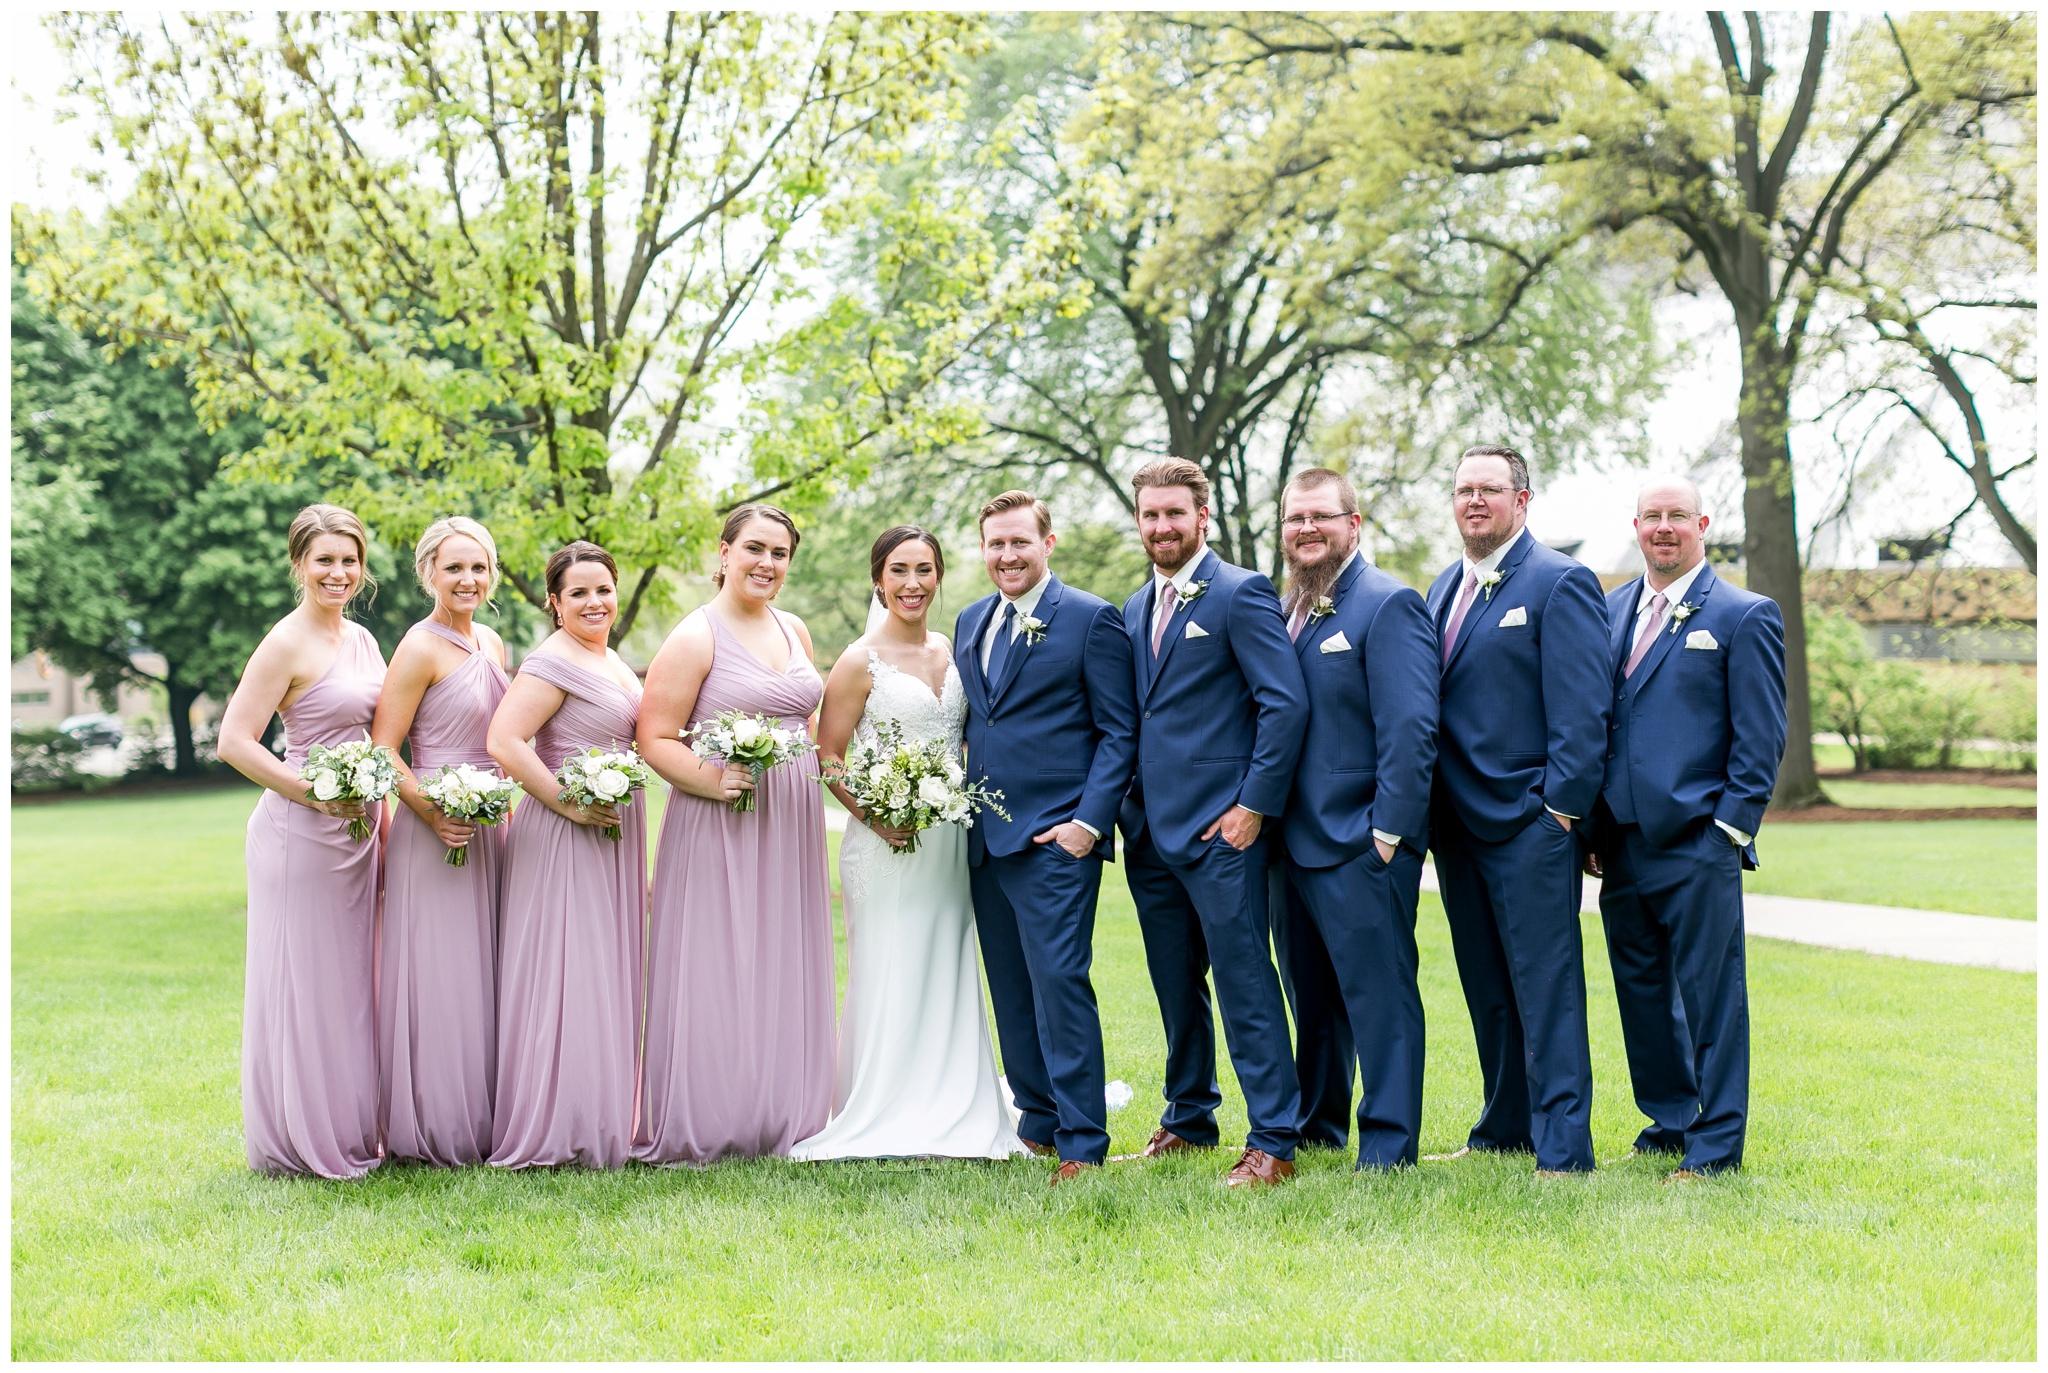 Union_south_Wedding_Madison_Wisconsin_Caynay_Photo_3663.jpg